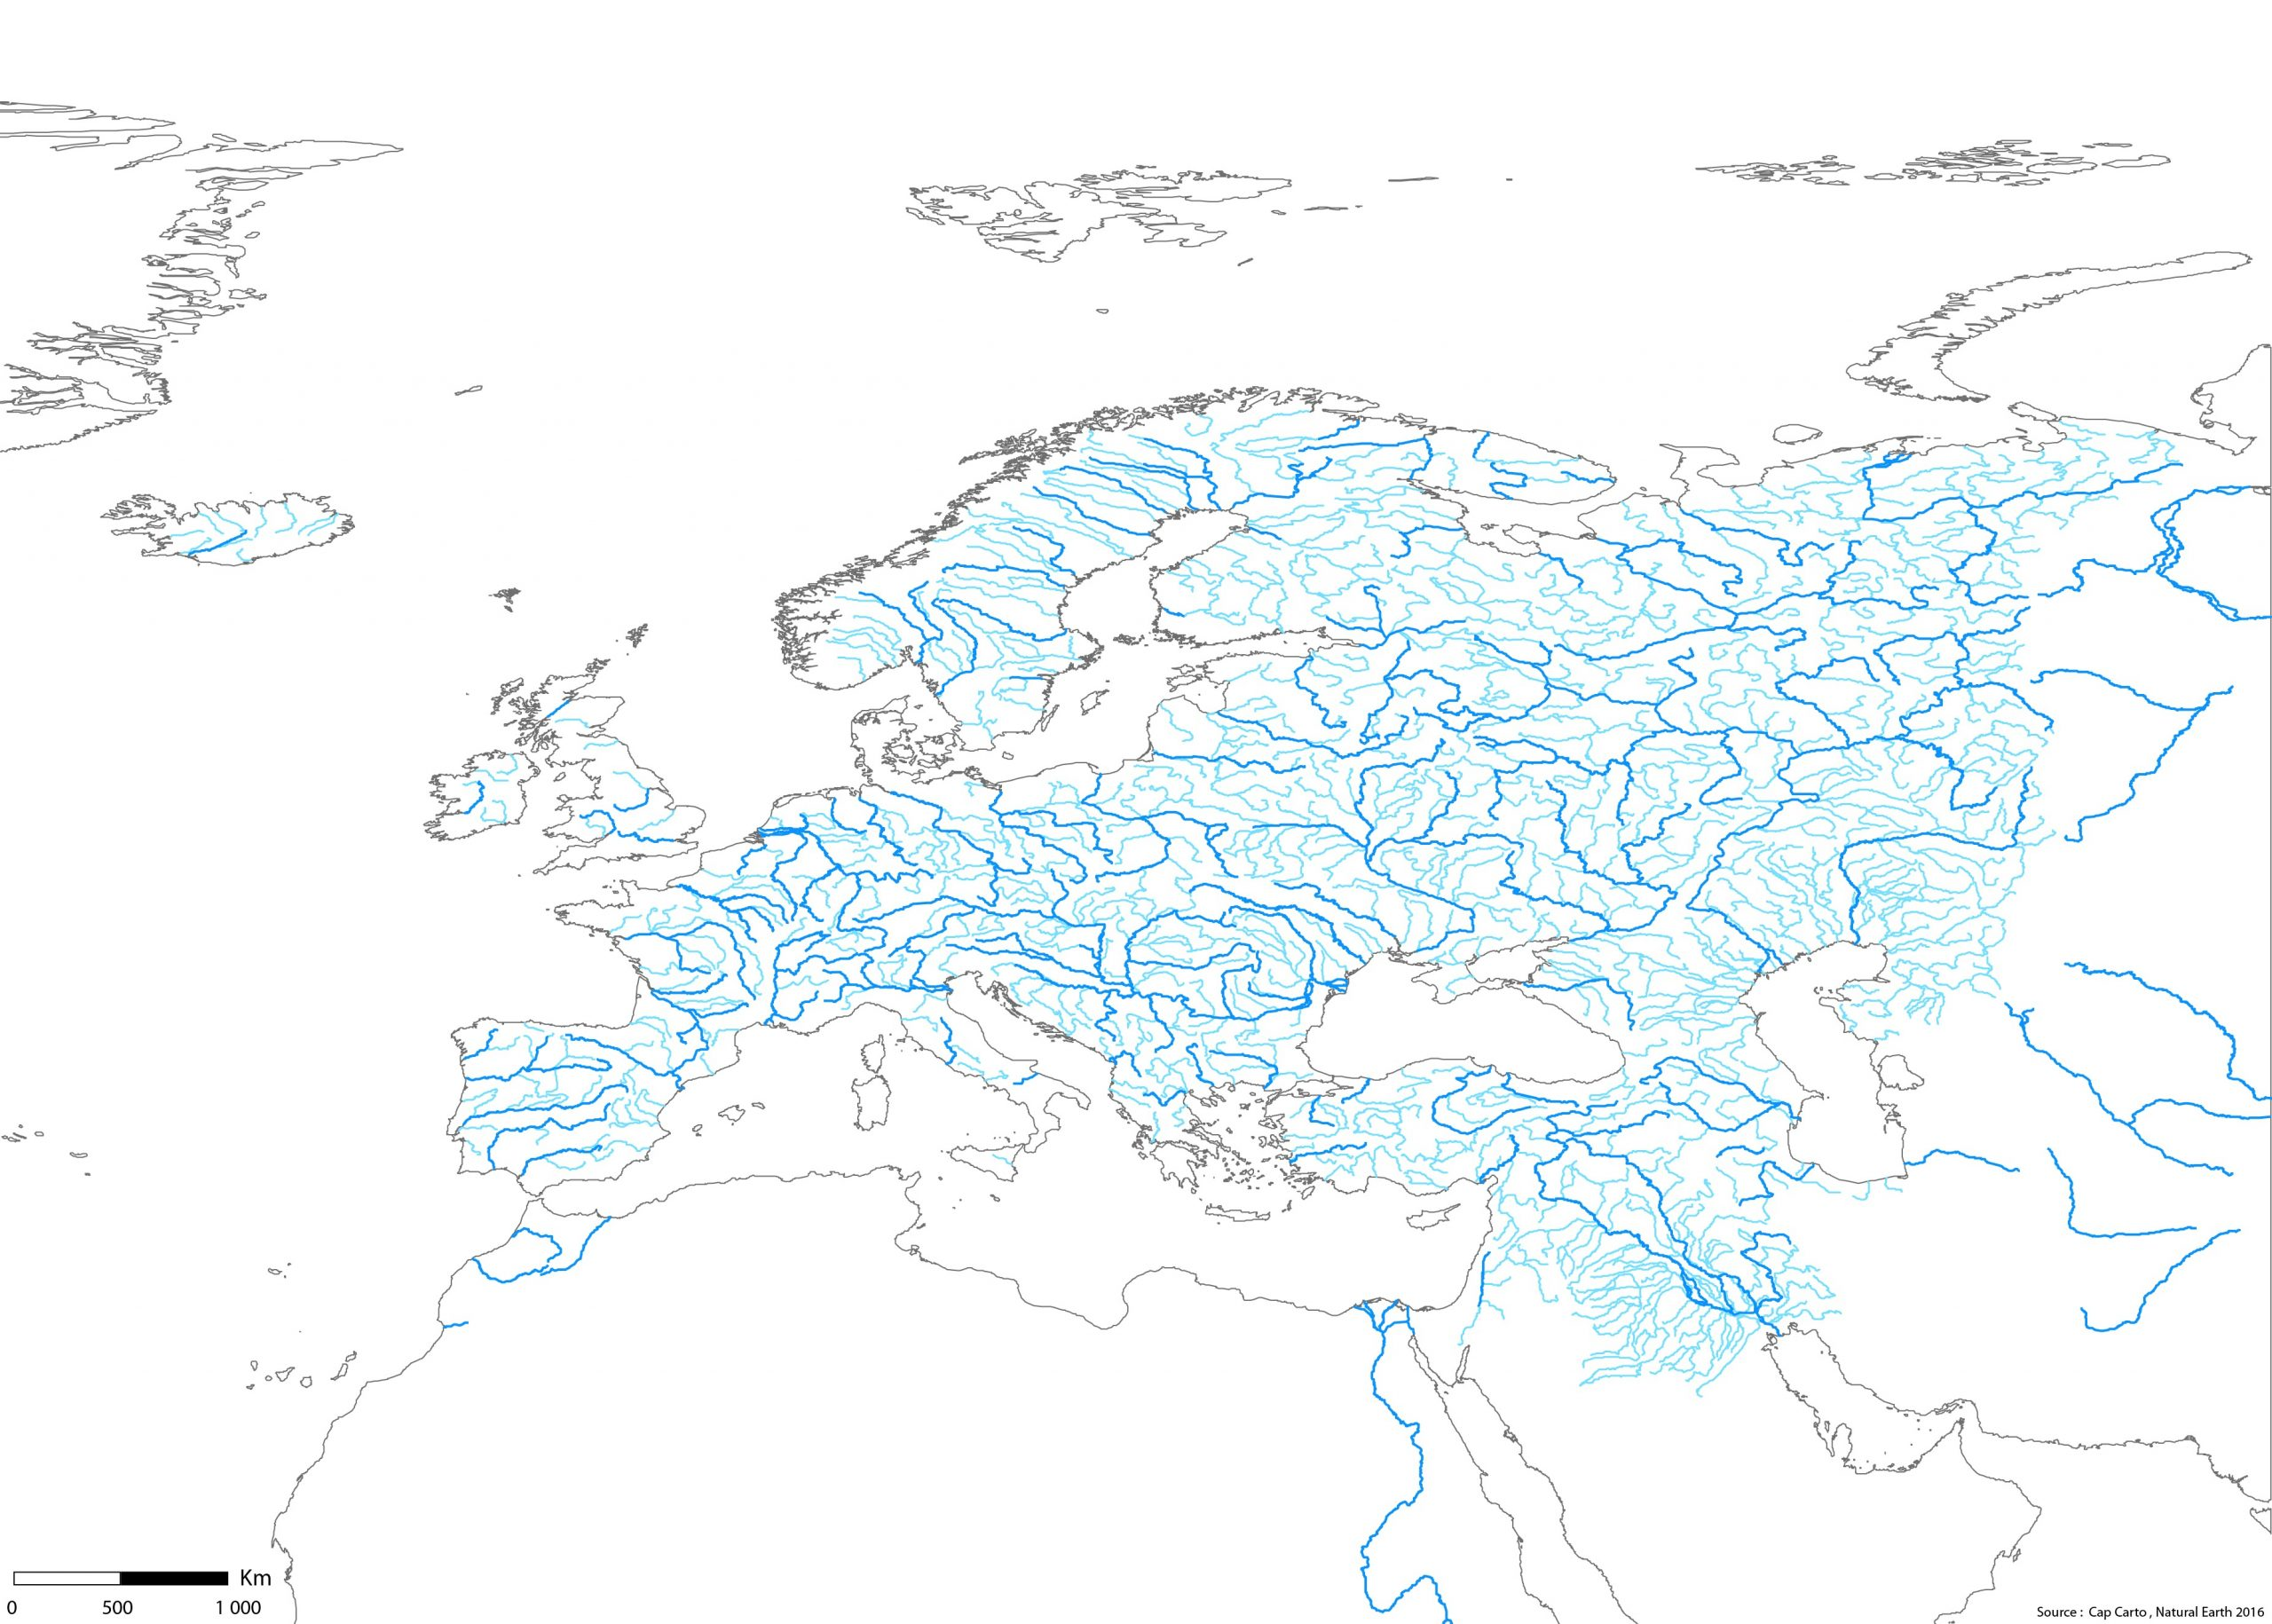 Europe-Fleuves-Rivieres-Echelle-Wgs84-Couleur-Vierge - Cap Carto encequiconcerne Carte Fleuve Europe Vierge